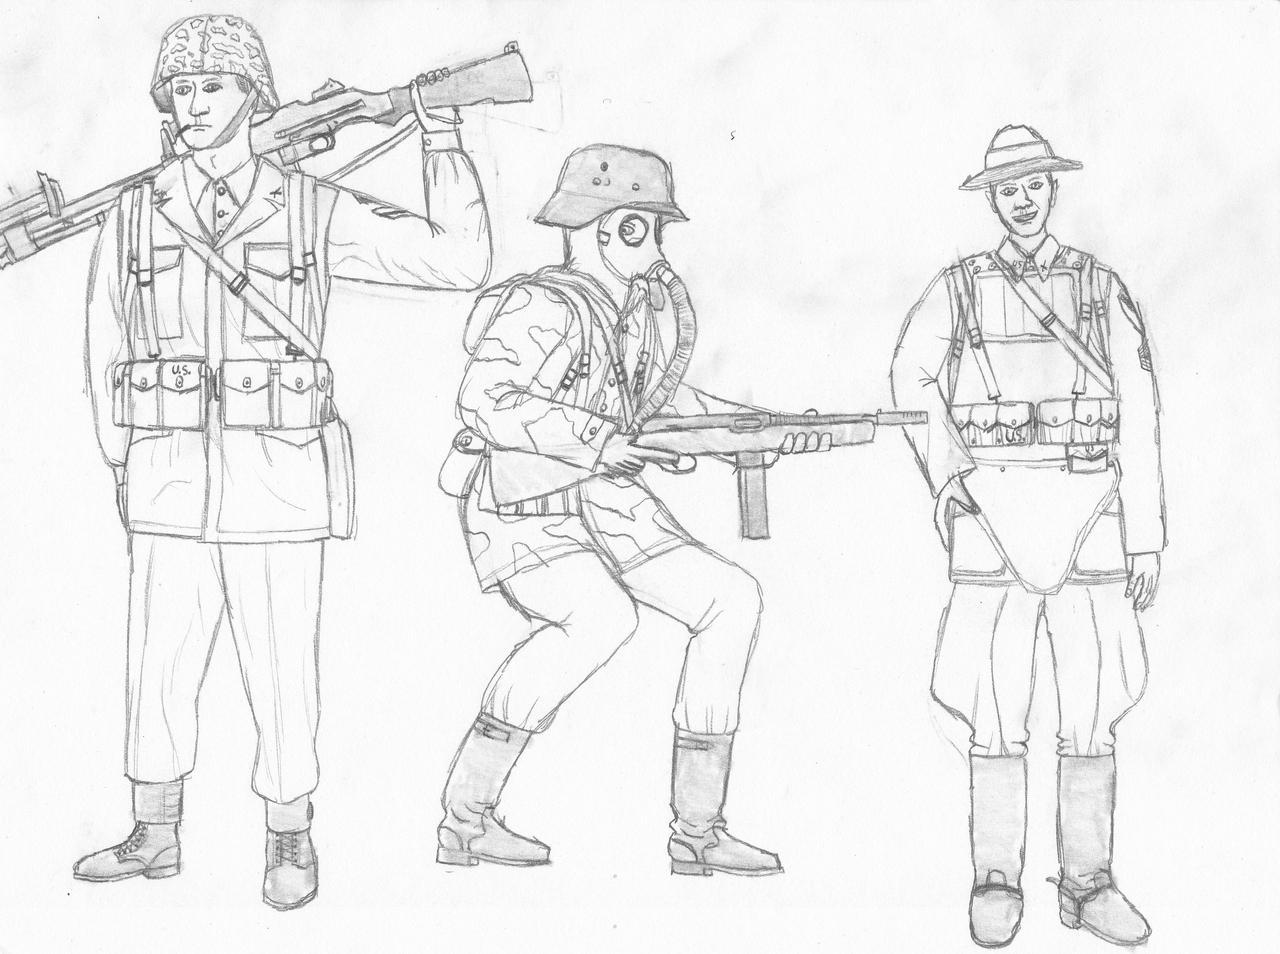 _tl_191__union_military_uniforms_pt__2_by_marlowski_decie5l-fullview.jpg